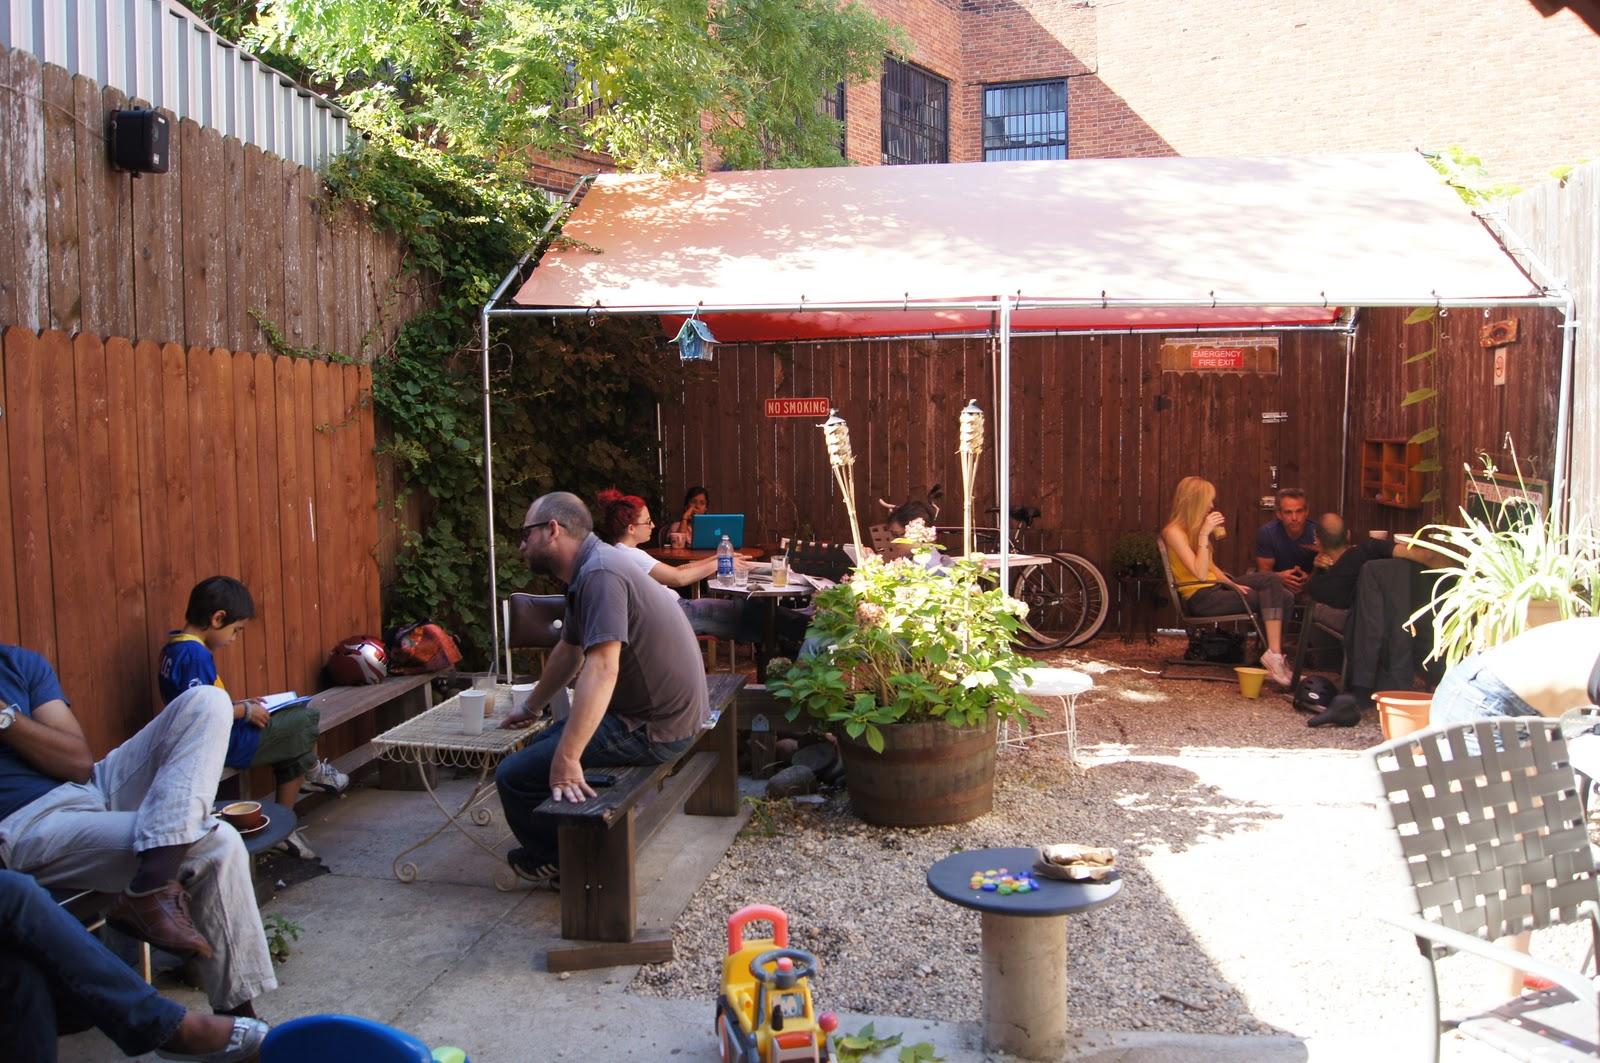 Laptop Coffee Suntan Brooklyn S Best Outdoor Cafes To Do Work In